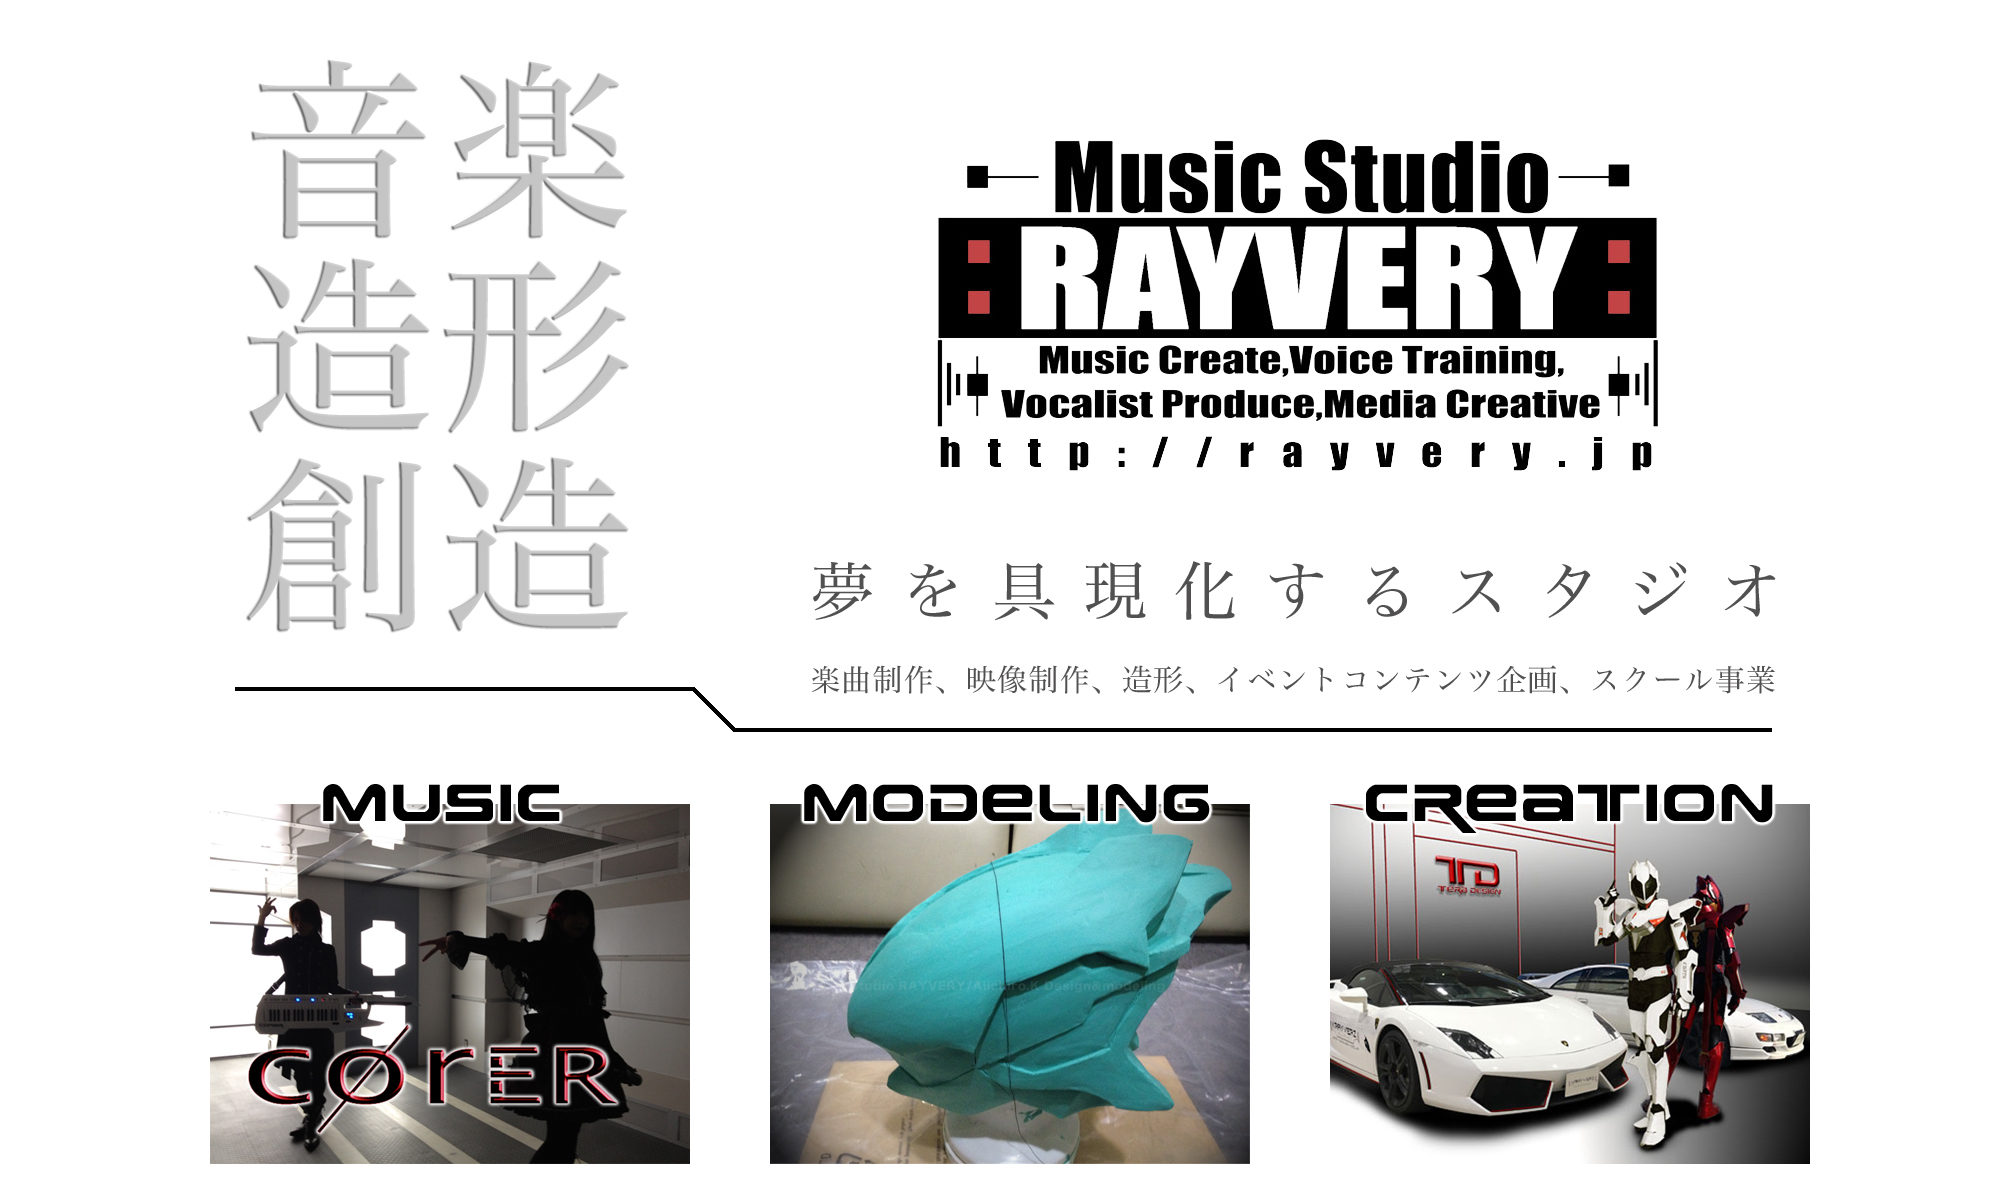 Studio RAYVERY/スタジオ レイヴァリー